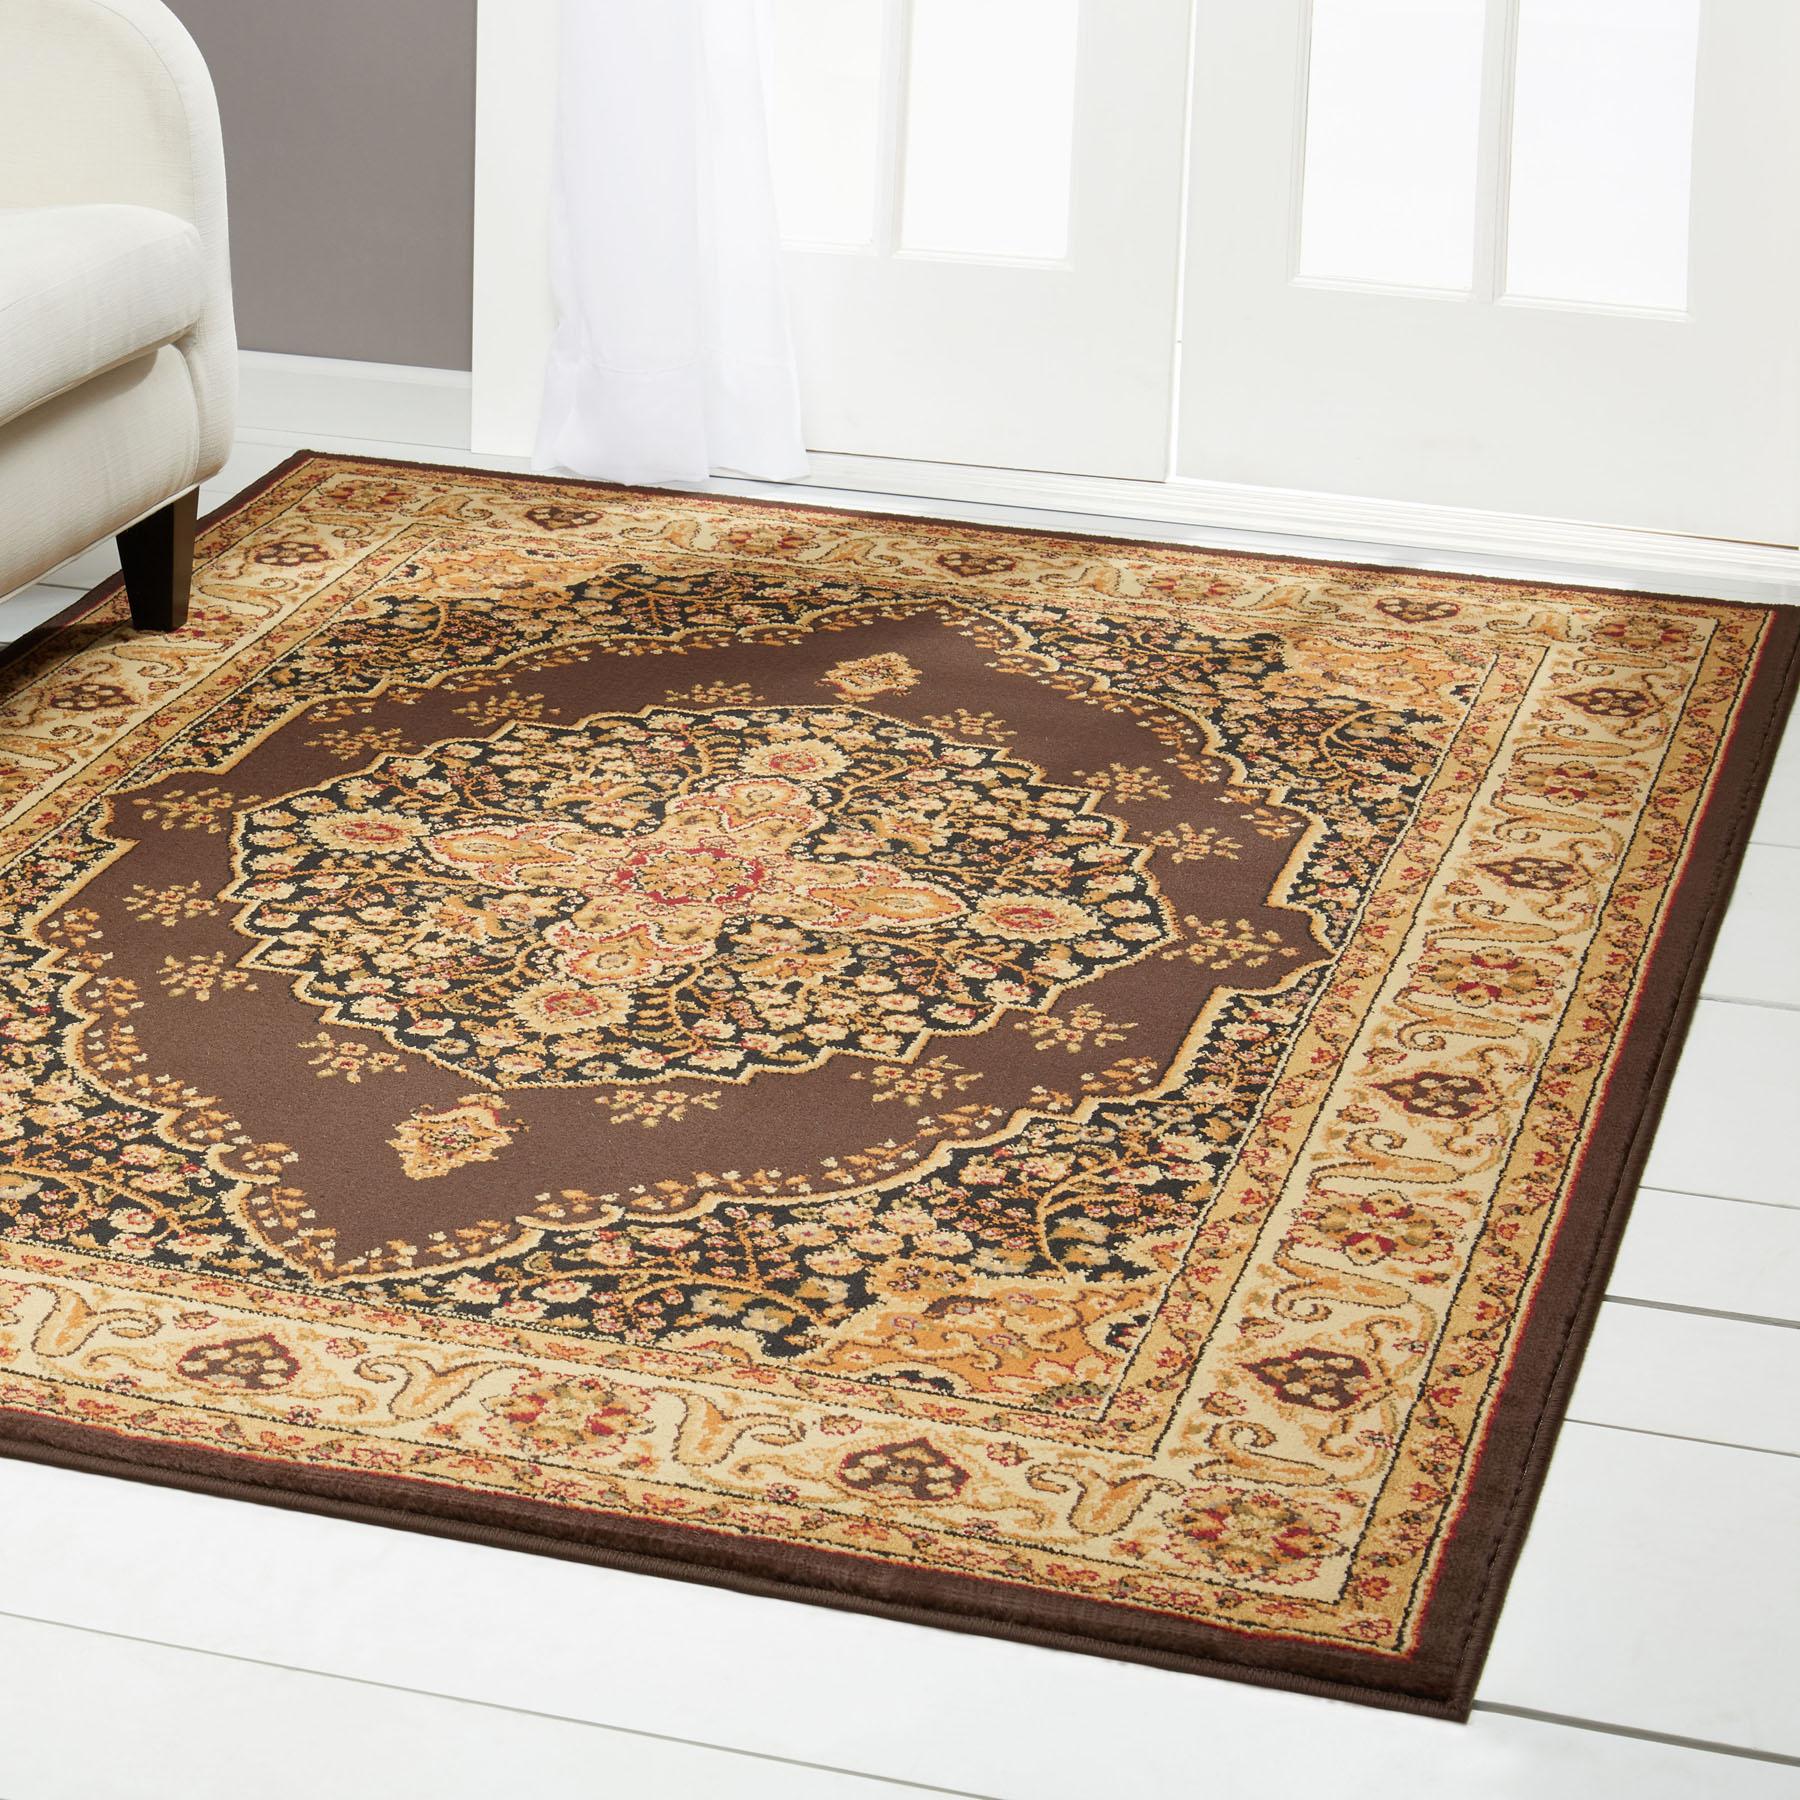 Brown Medallion Oriental Area Rug 8x11 Persian Border Carpet Actual